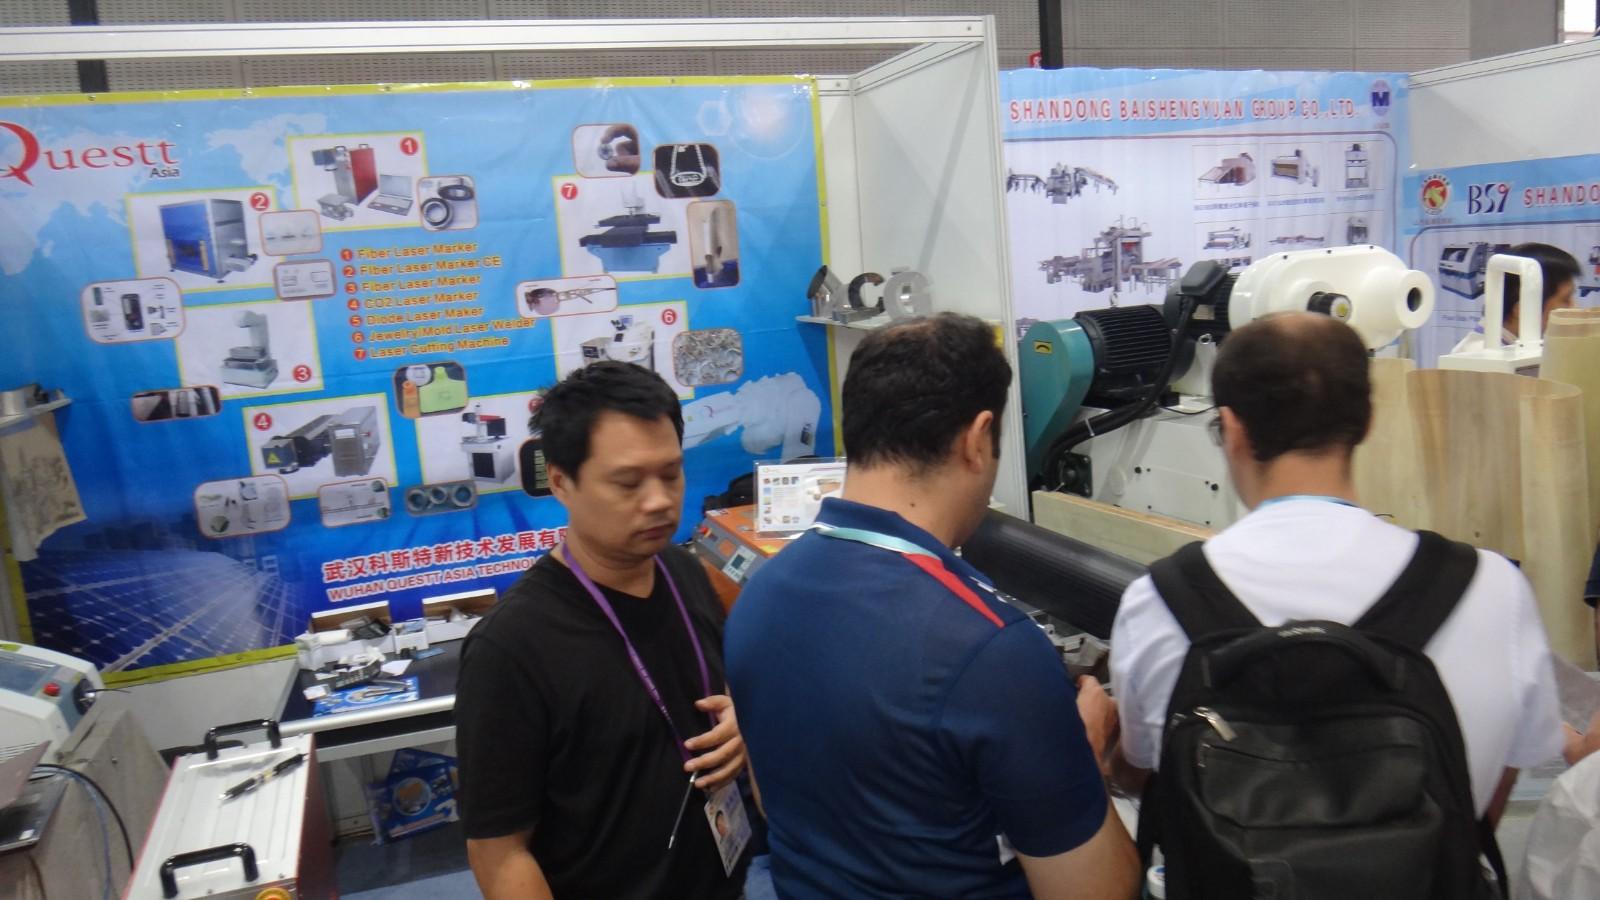 news-Guangzhou Exhibition-QUESTT-img-1